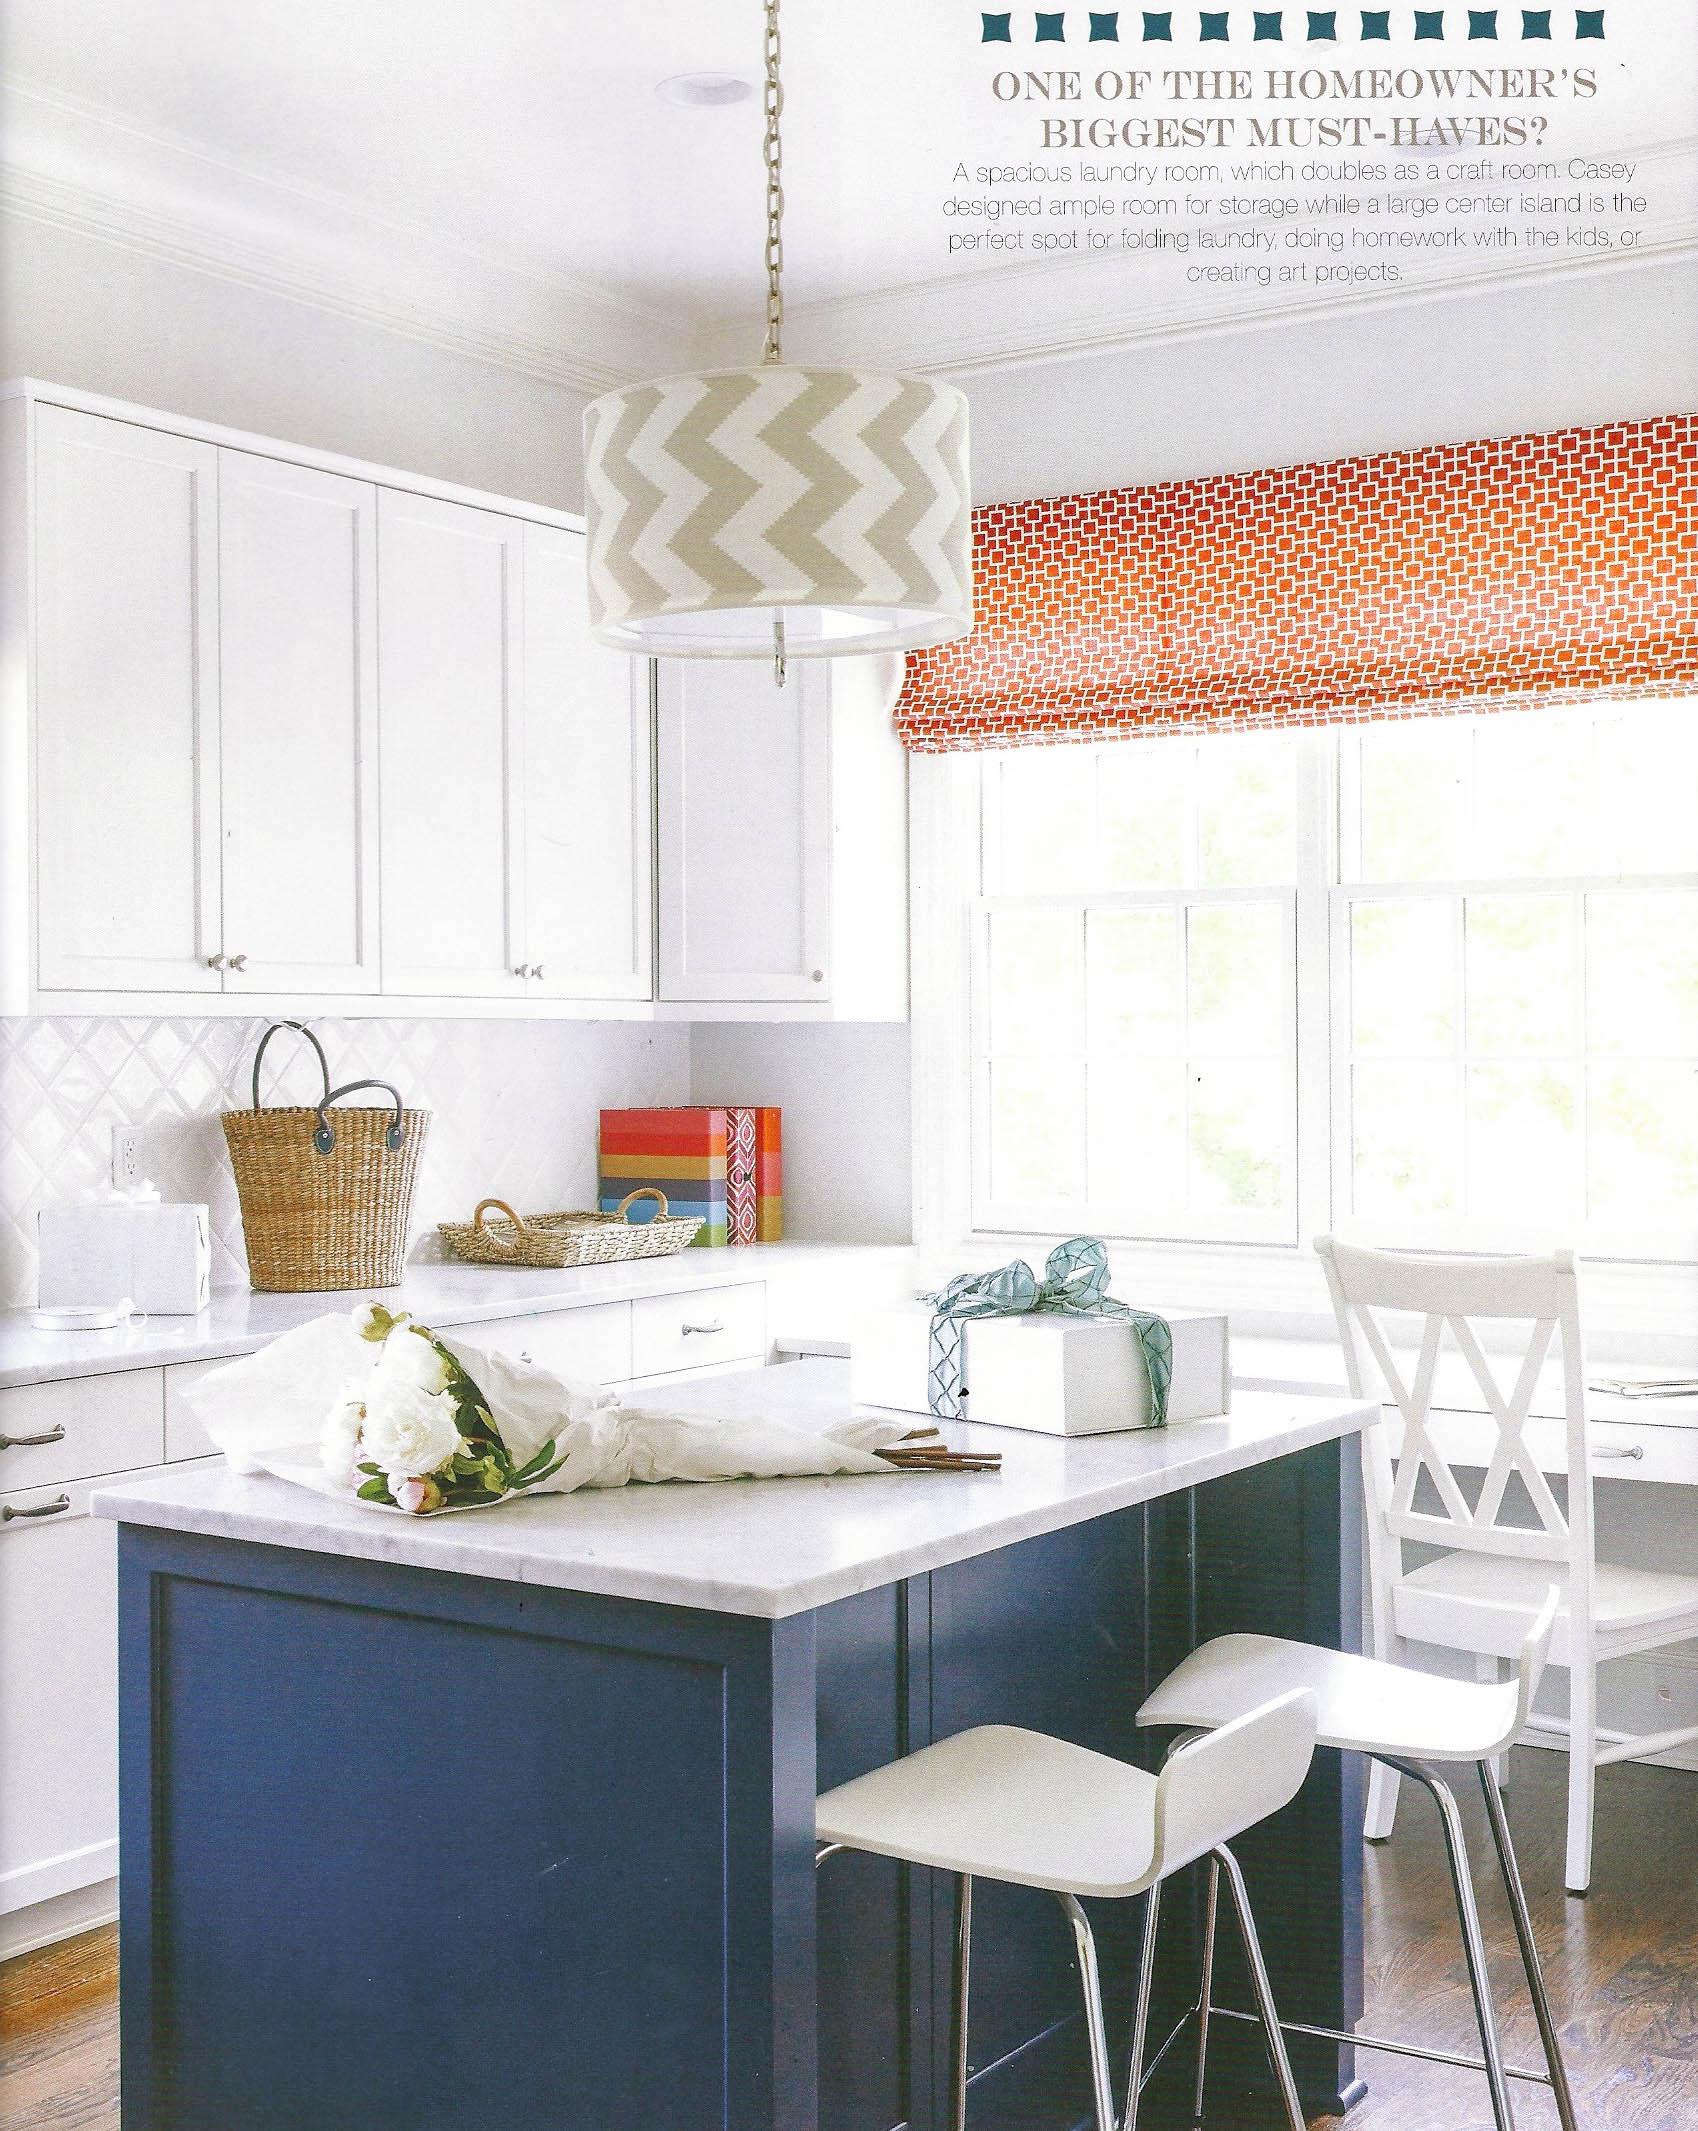 Laundry room Interior Design SouthPark Magazine